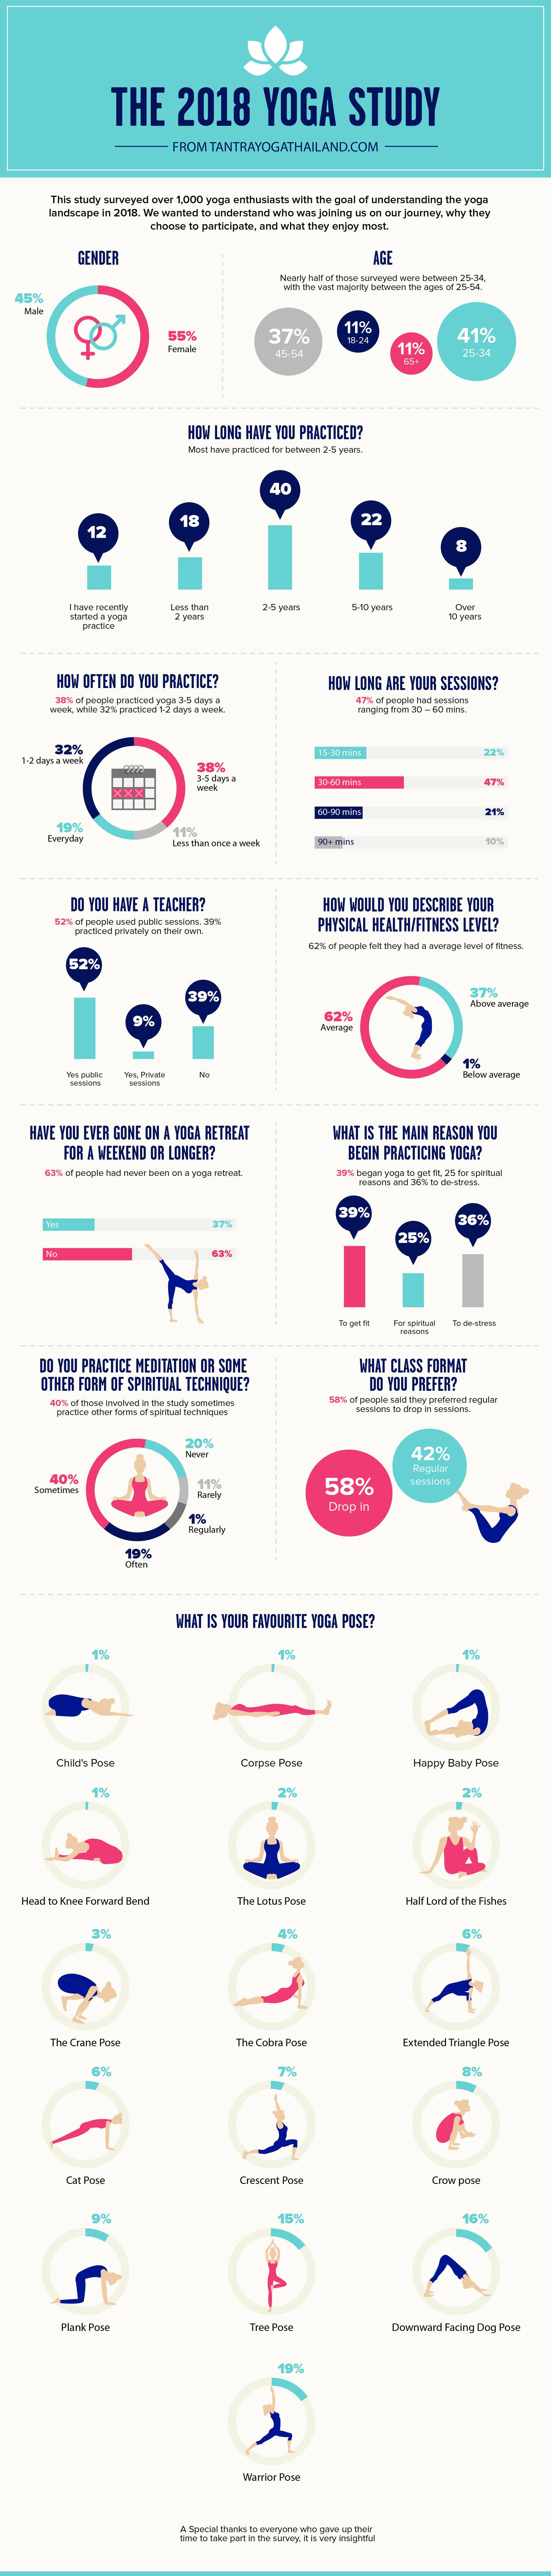 yoga study infographic